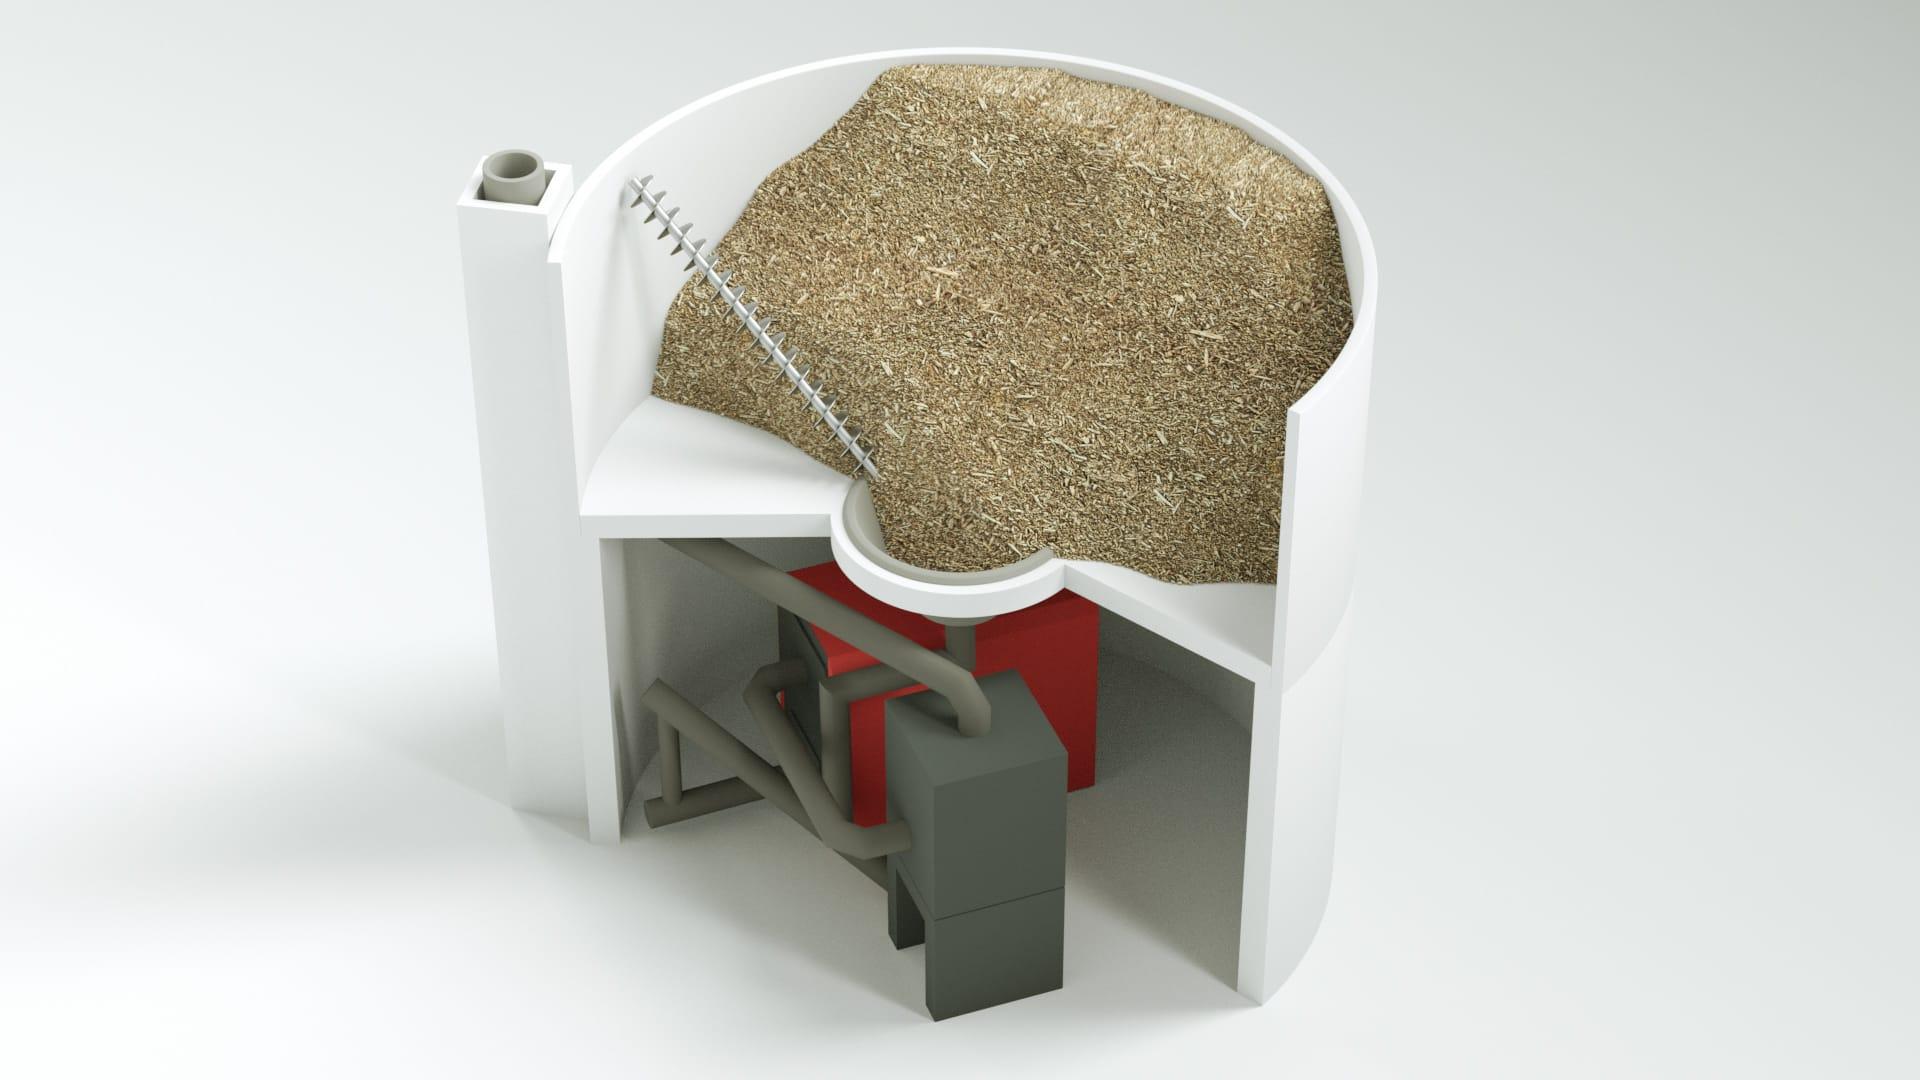 Modell bild Nolting Holzfeuerung System